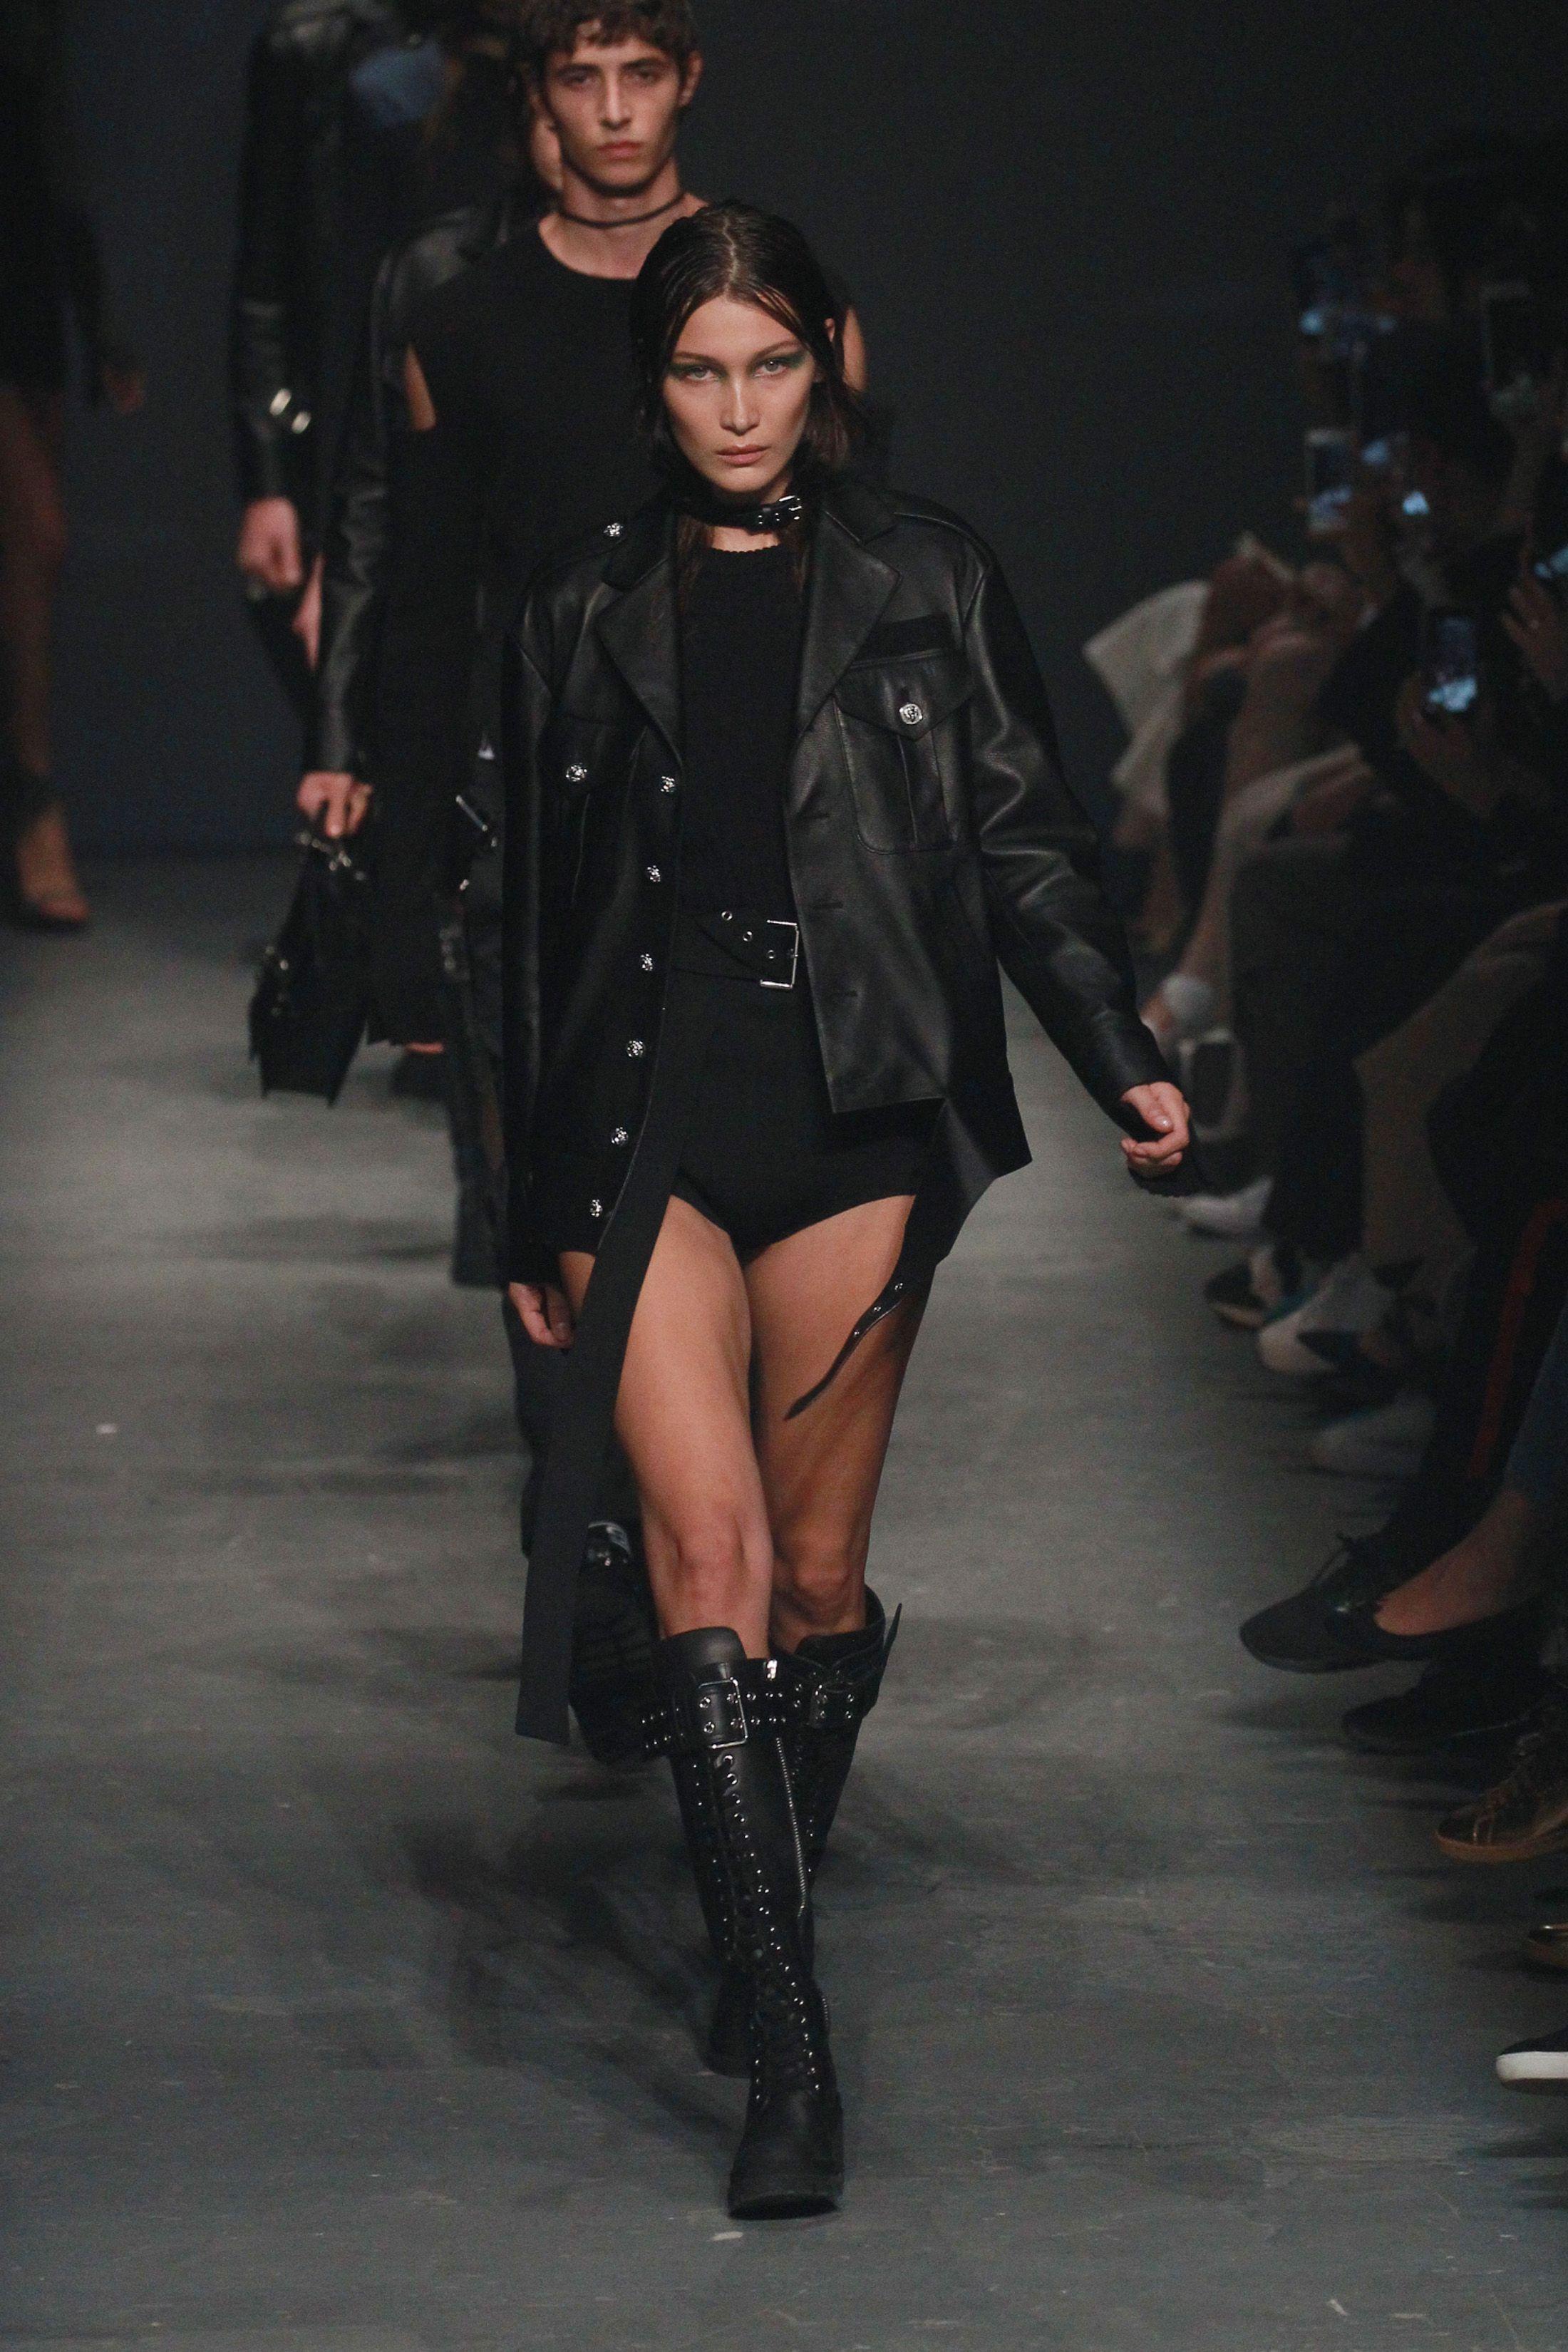 Bella Hadid for Versus Versace, London Fashion Week SS17